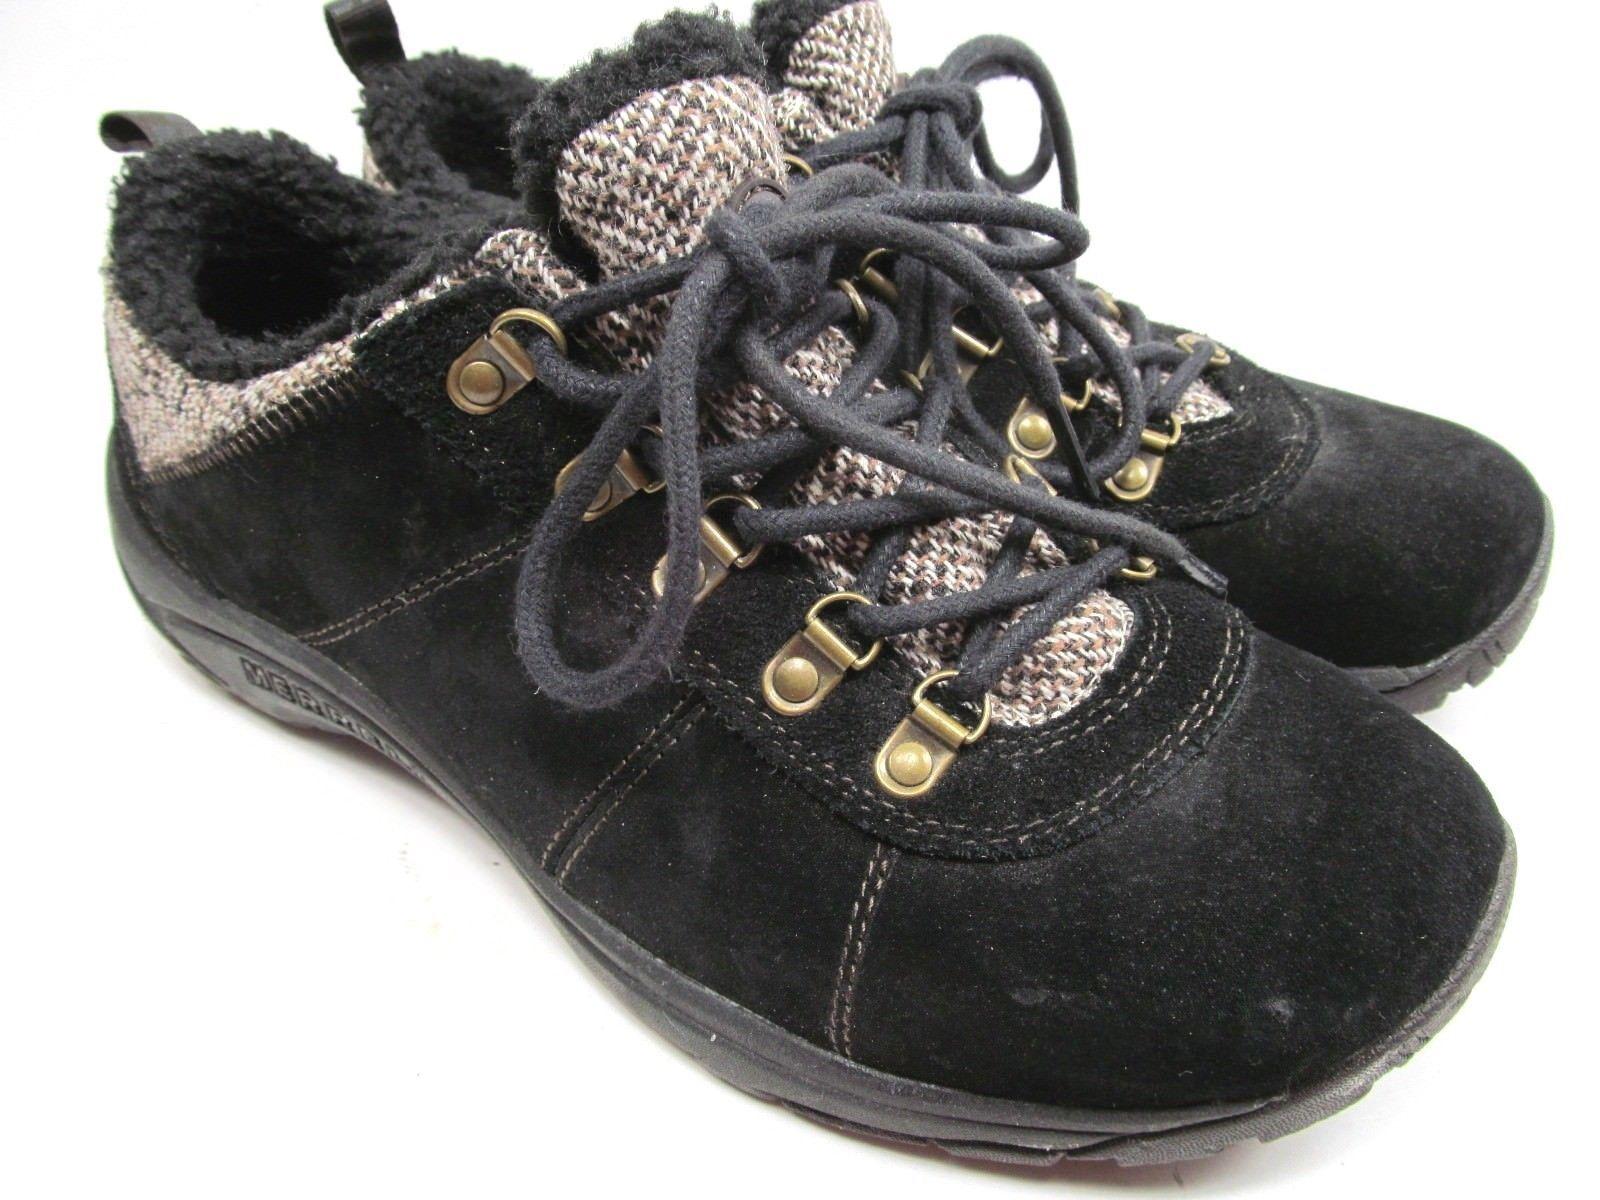 MERRELL Performance Women's Black Suede & Faux Fur Walking Shoes 9 M